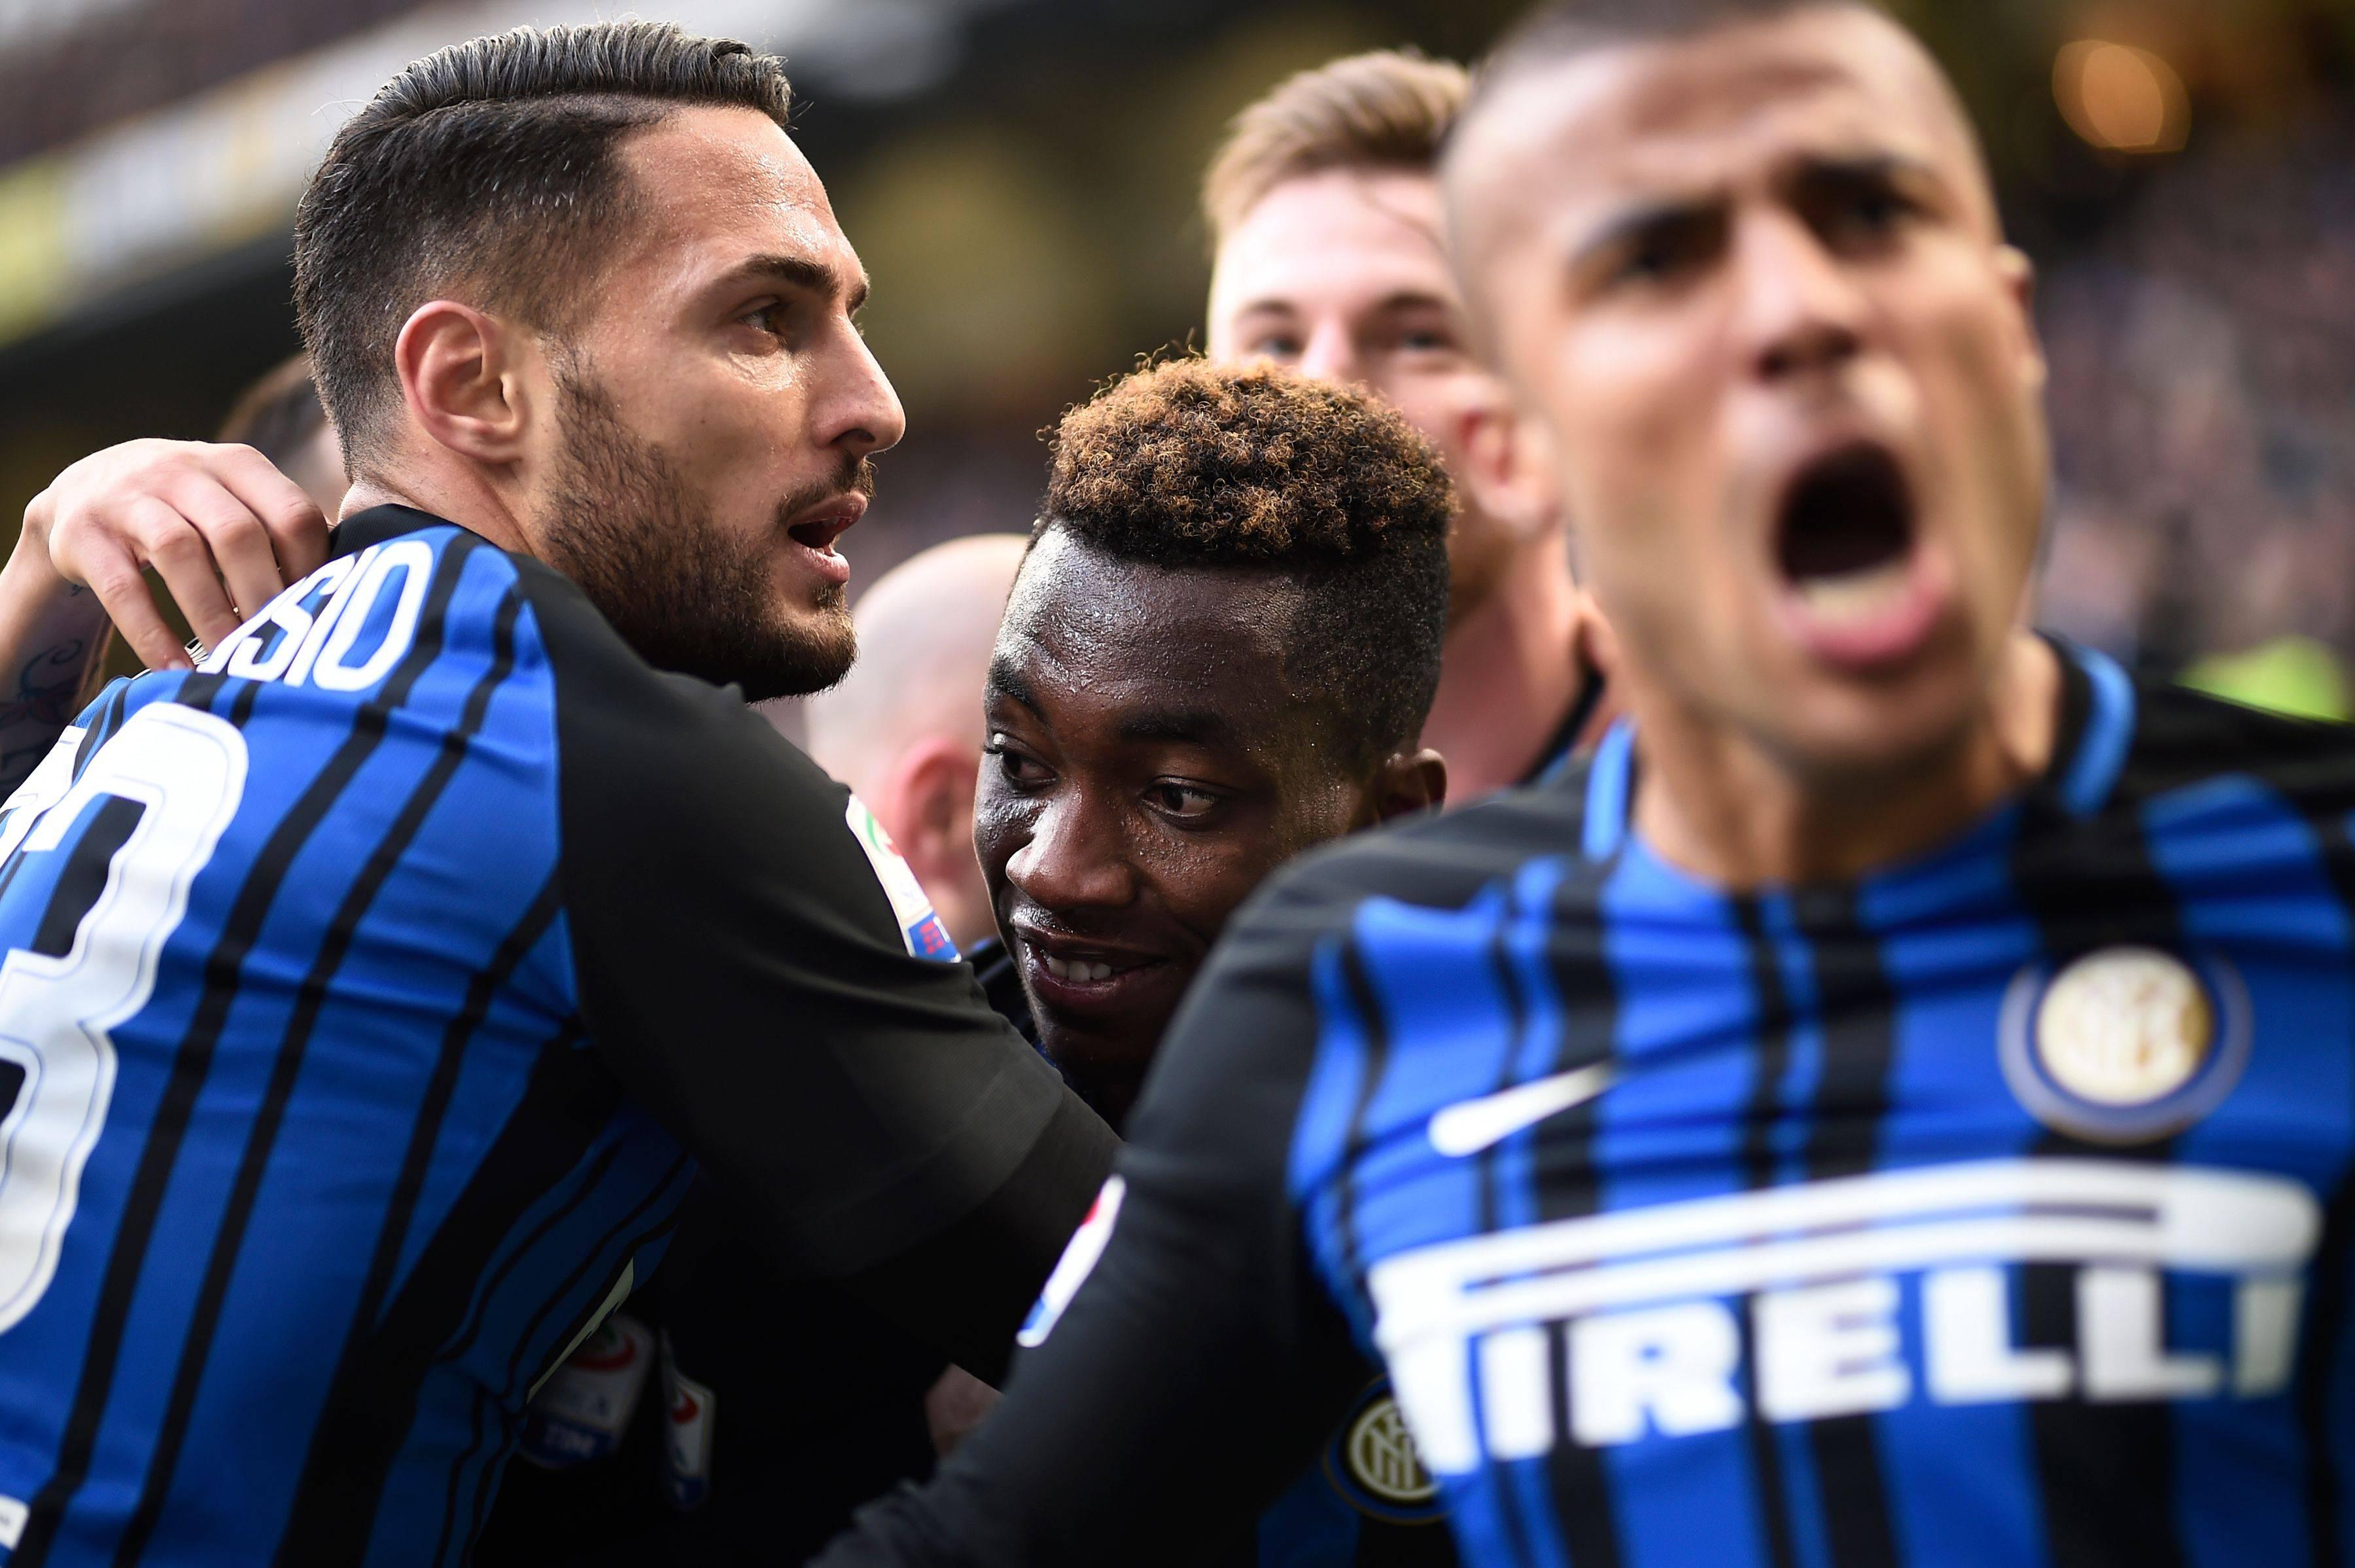 D'Amrosio, Inter